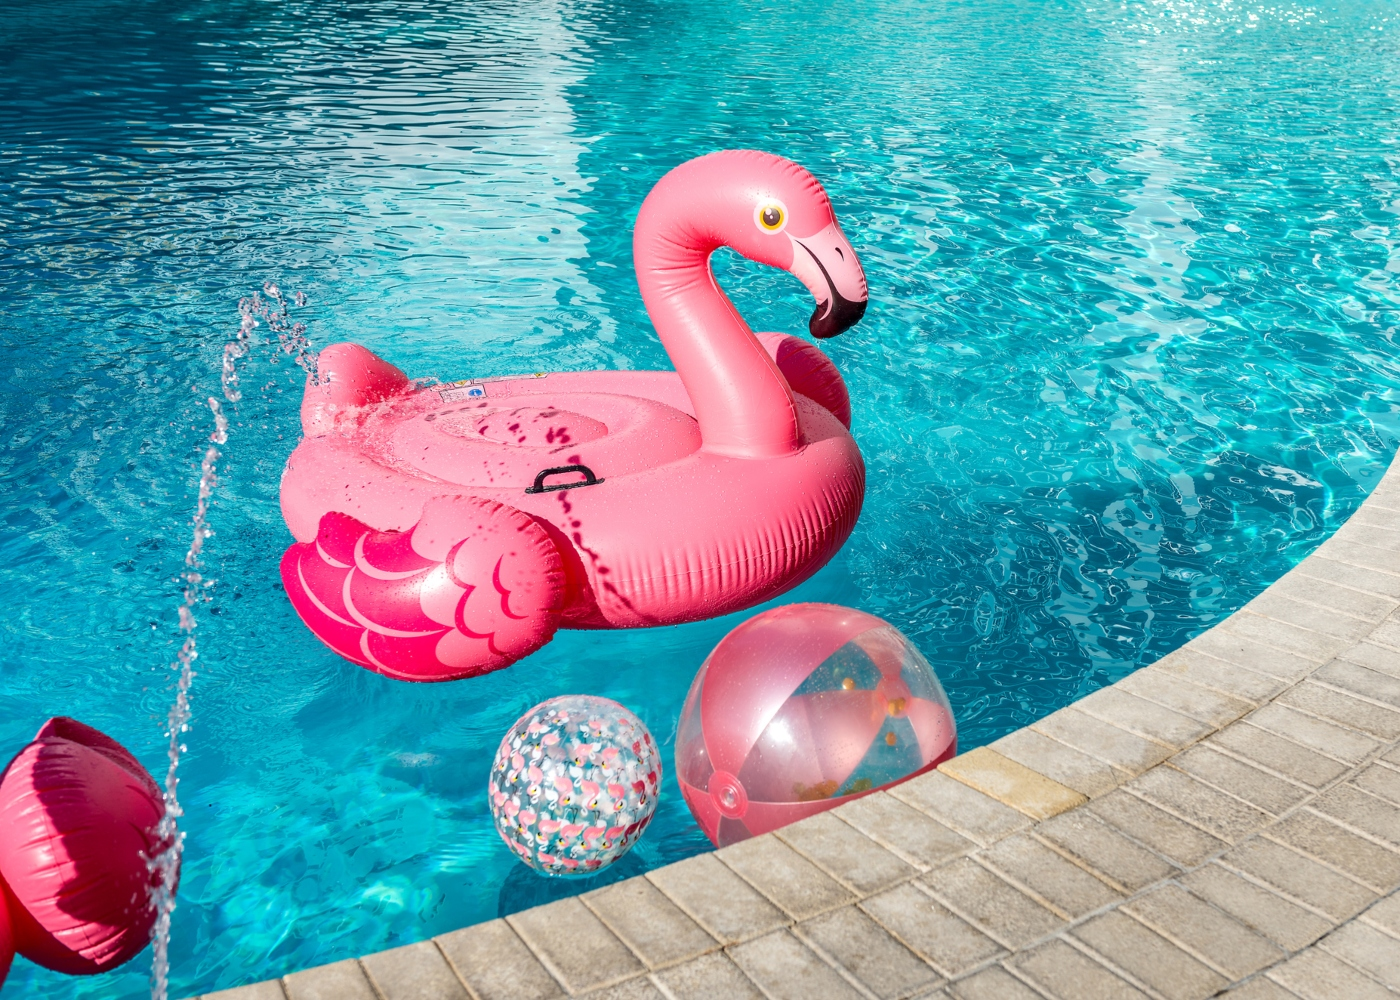 Bóia e bolas na piscina